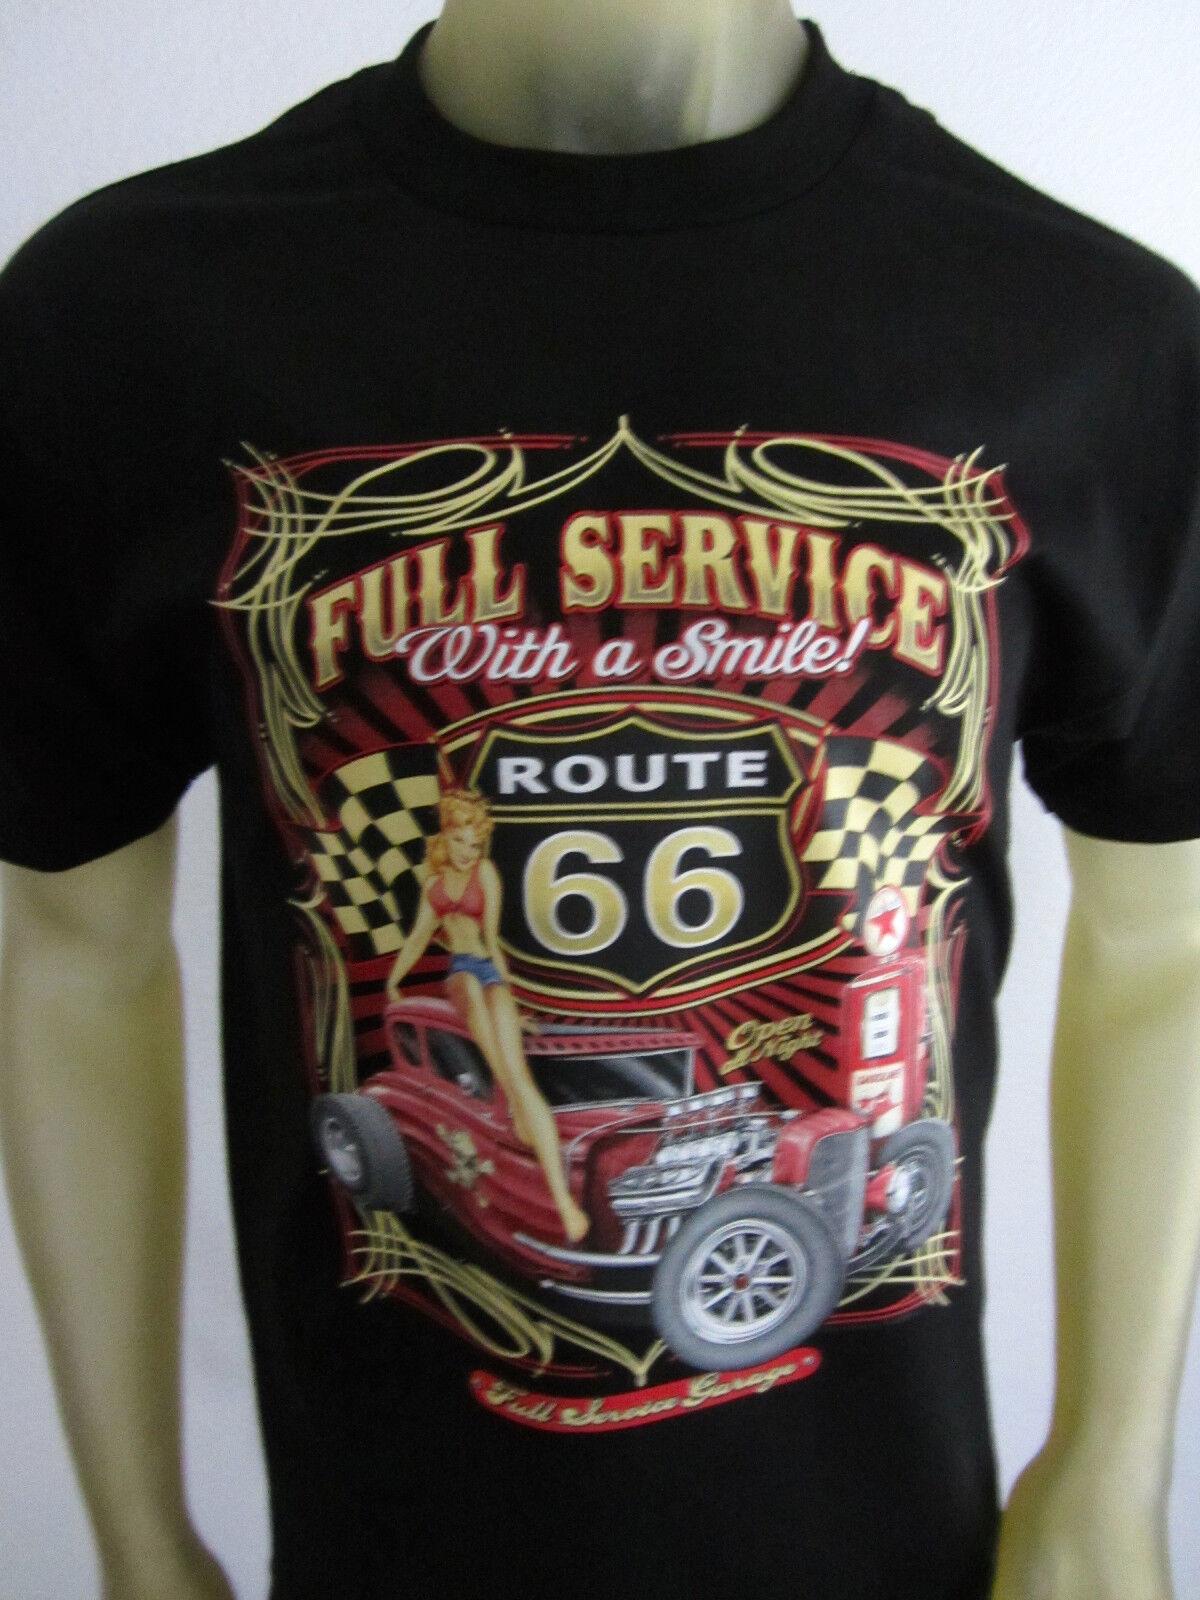 f2536b2e Old Skool Gearhead Pinup Garage Route 66 Tee Shirt Men'S Black Choose Your  Size Gift Print T Shirt,Hip Hop Tee Shirt,NEW ARRIVAL Tees Tshirts Printed  ...